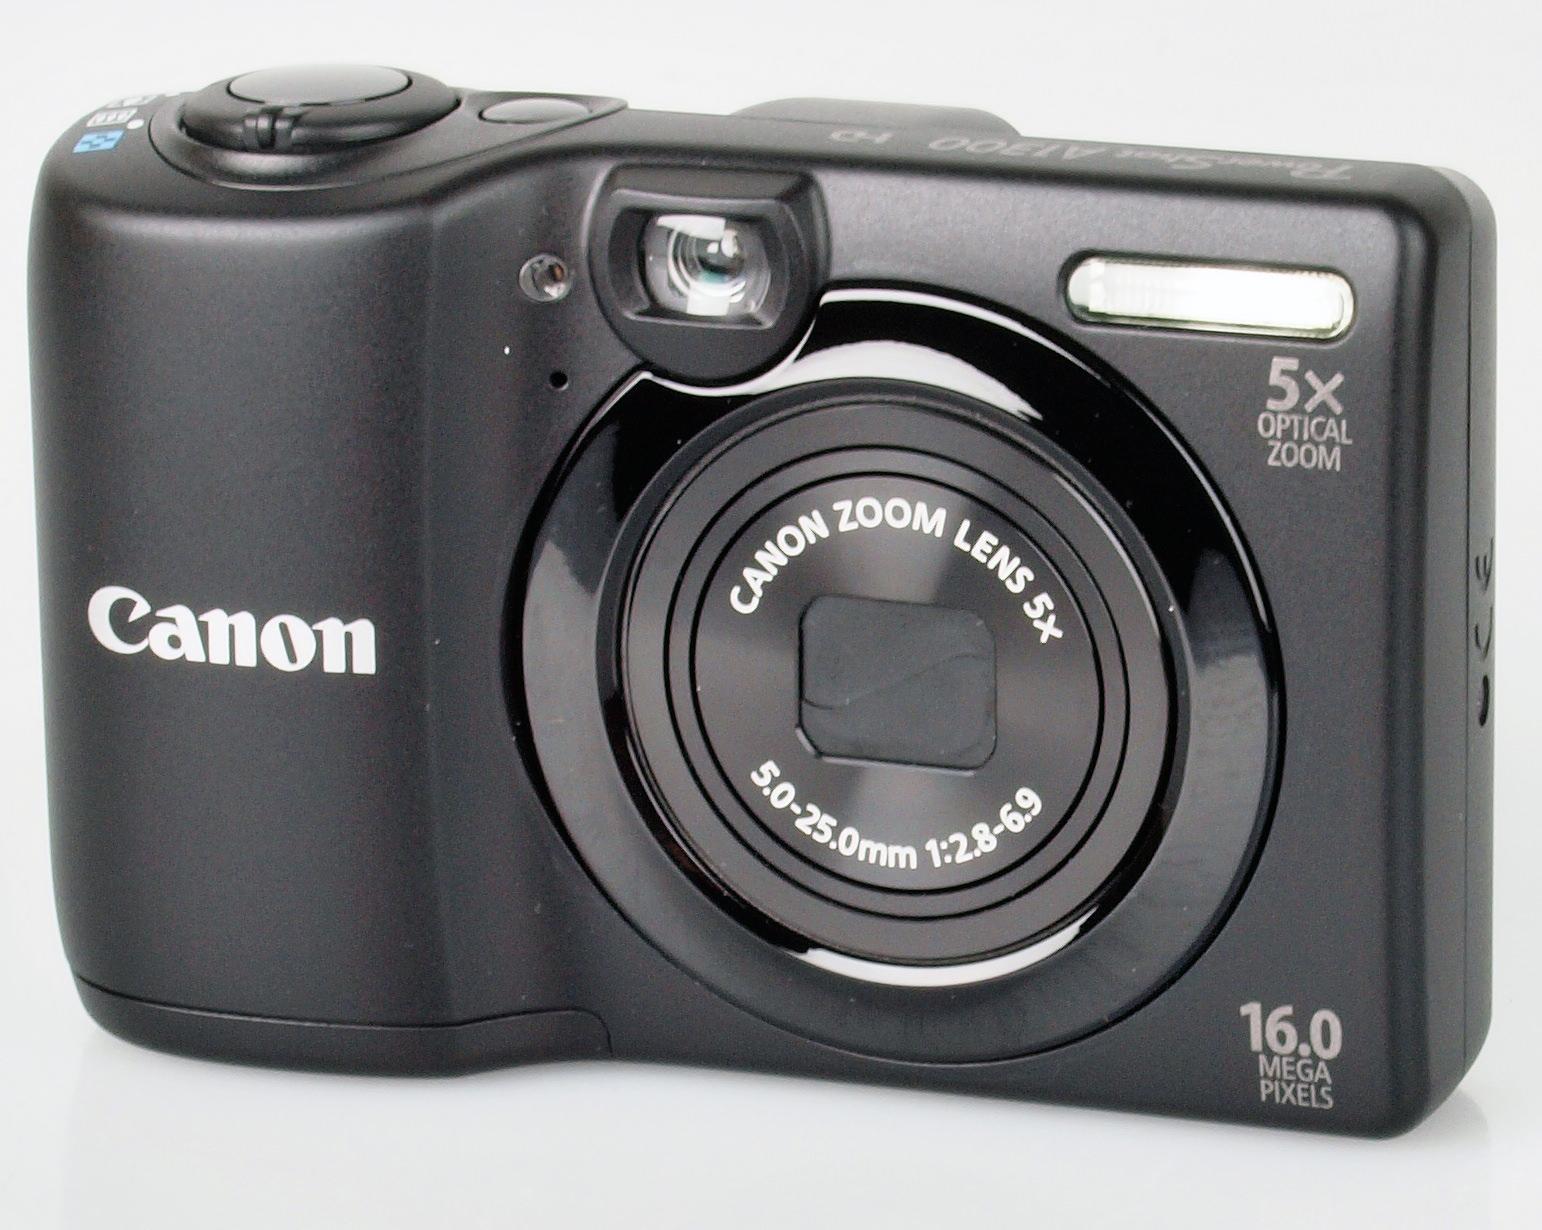 canon powershot a1300 digital camera review rh ephotozine com canon powershot a1300 digital camera manual canon powershot a1400 manual pdf